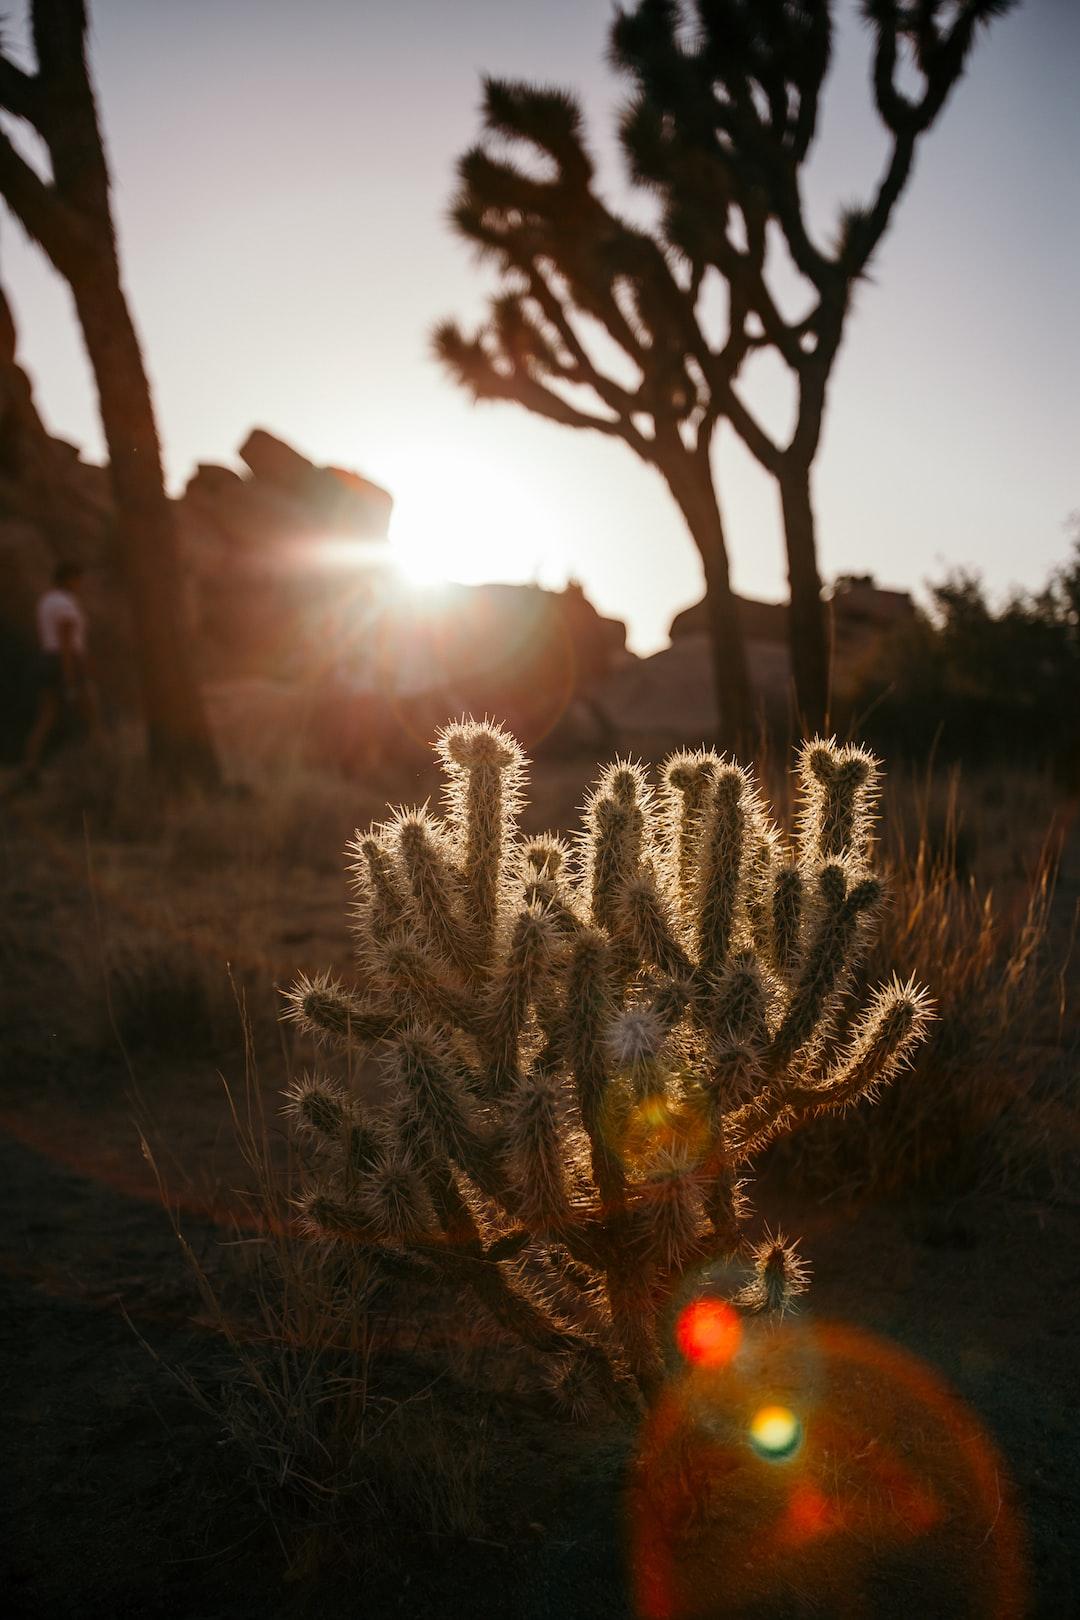 Baby Cactus in the Desert